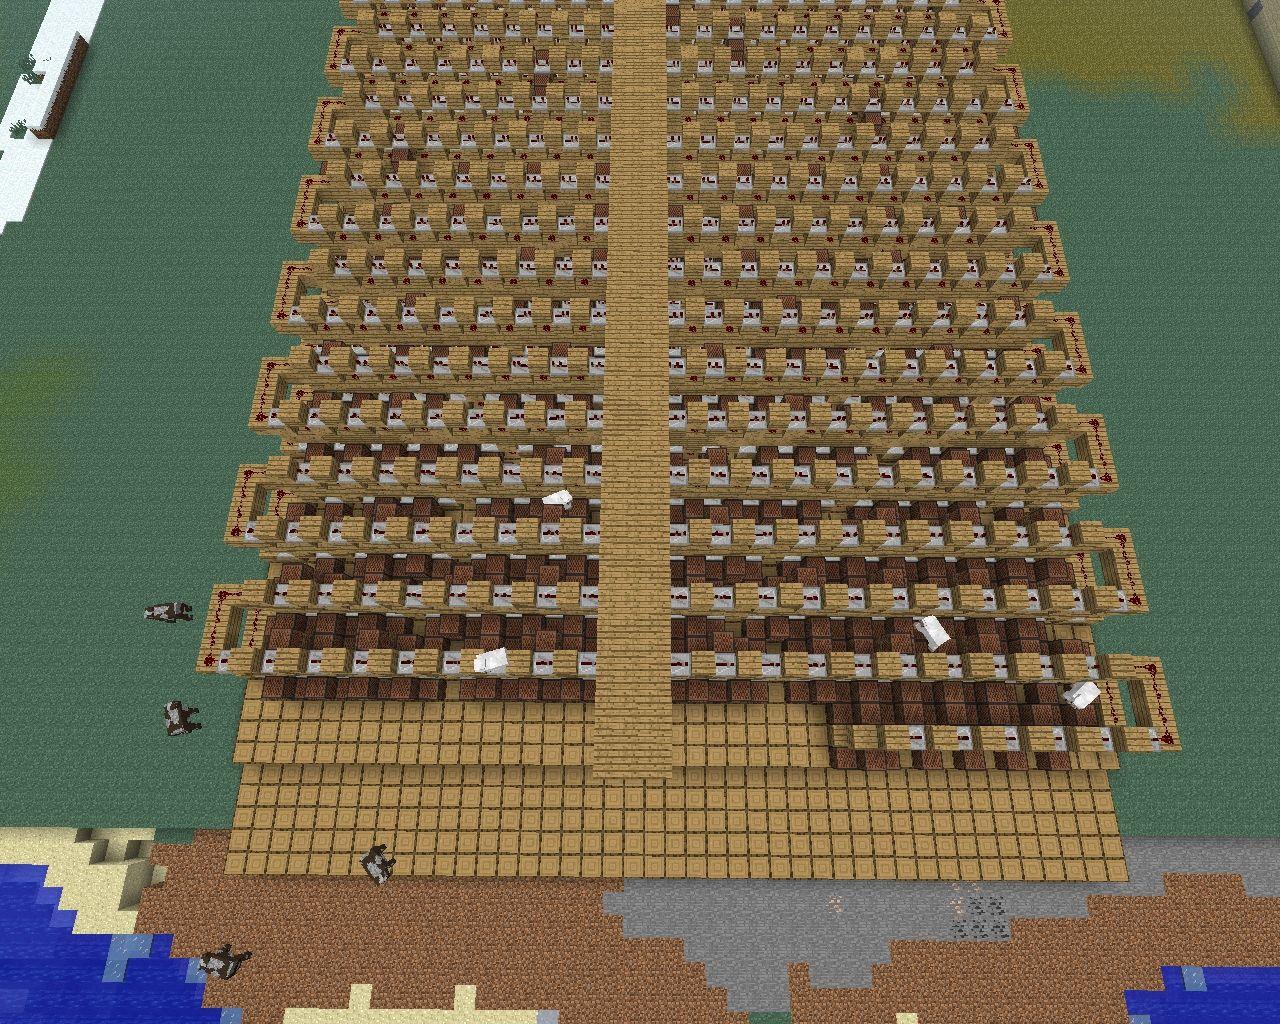 Portal Gun Mod 1.12.2/1.10.2 (Teleport to ... - Minecraft Mod